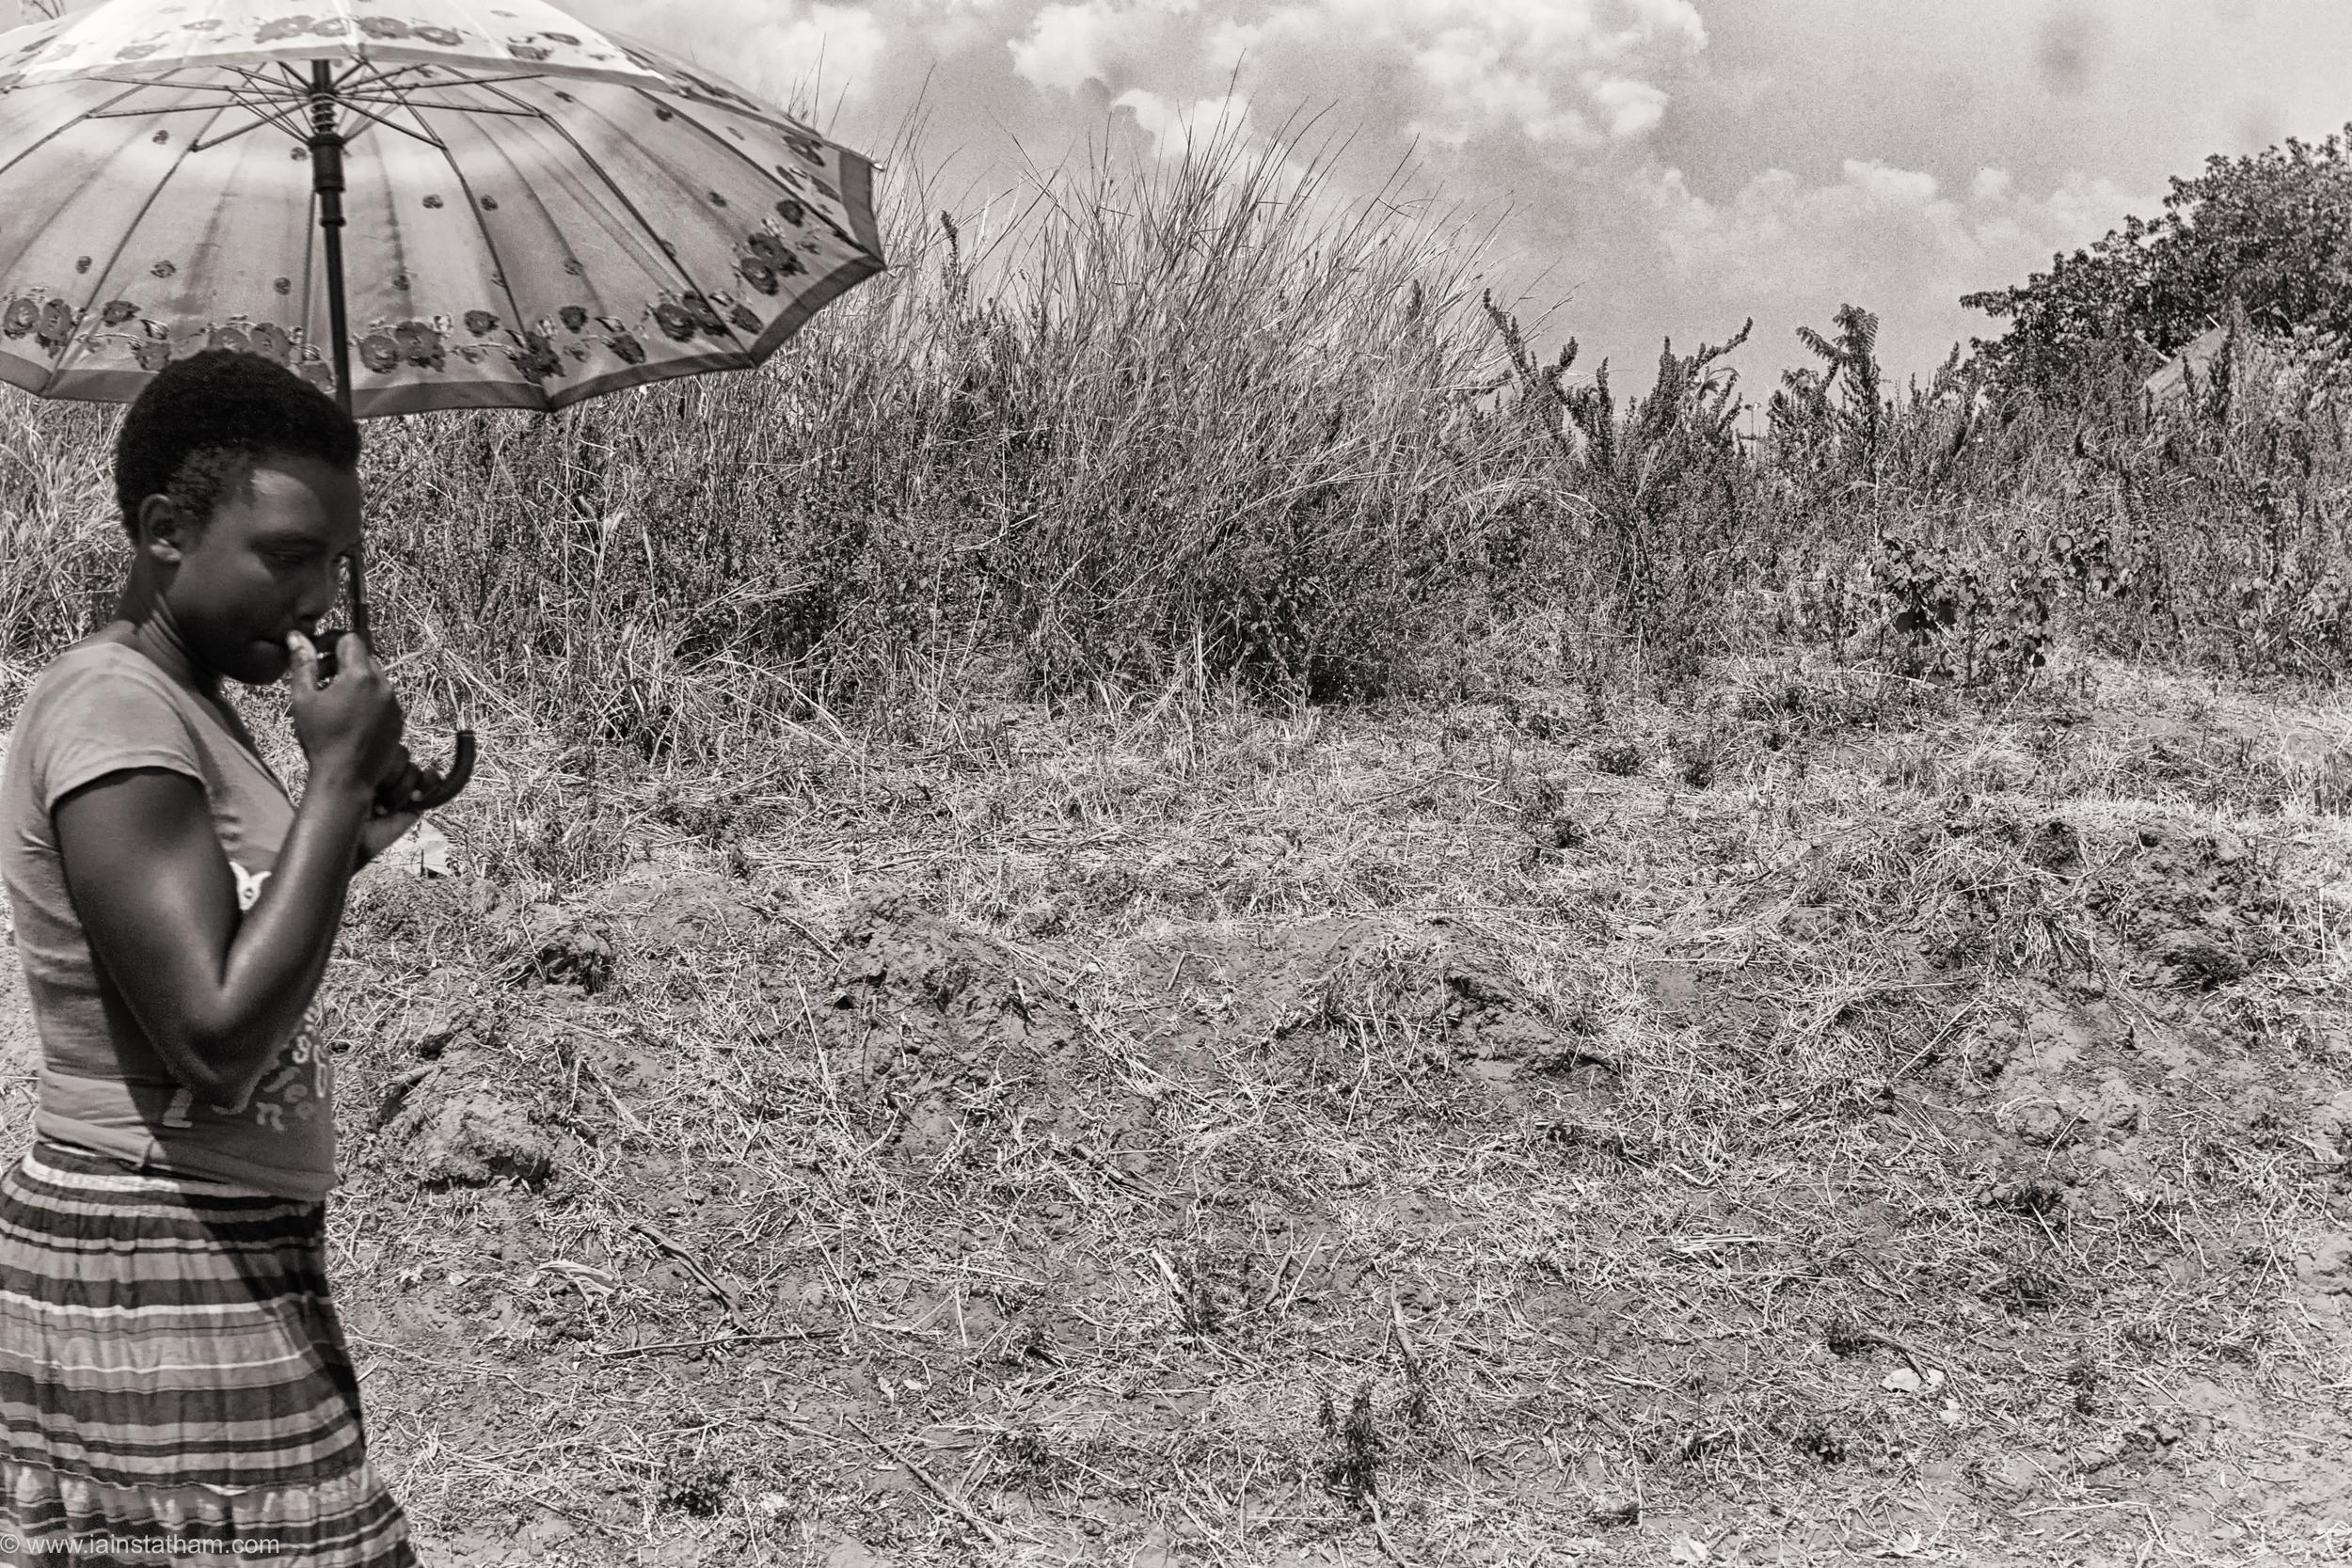 ug - south sudan refugees - dziapi - bw-2.jpg